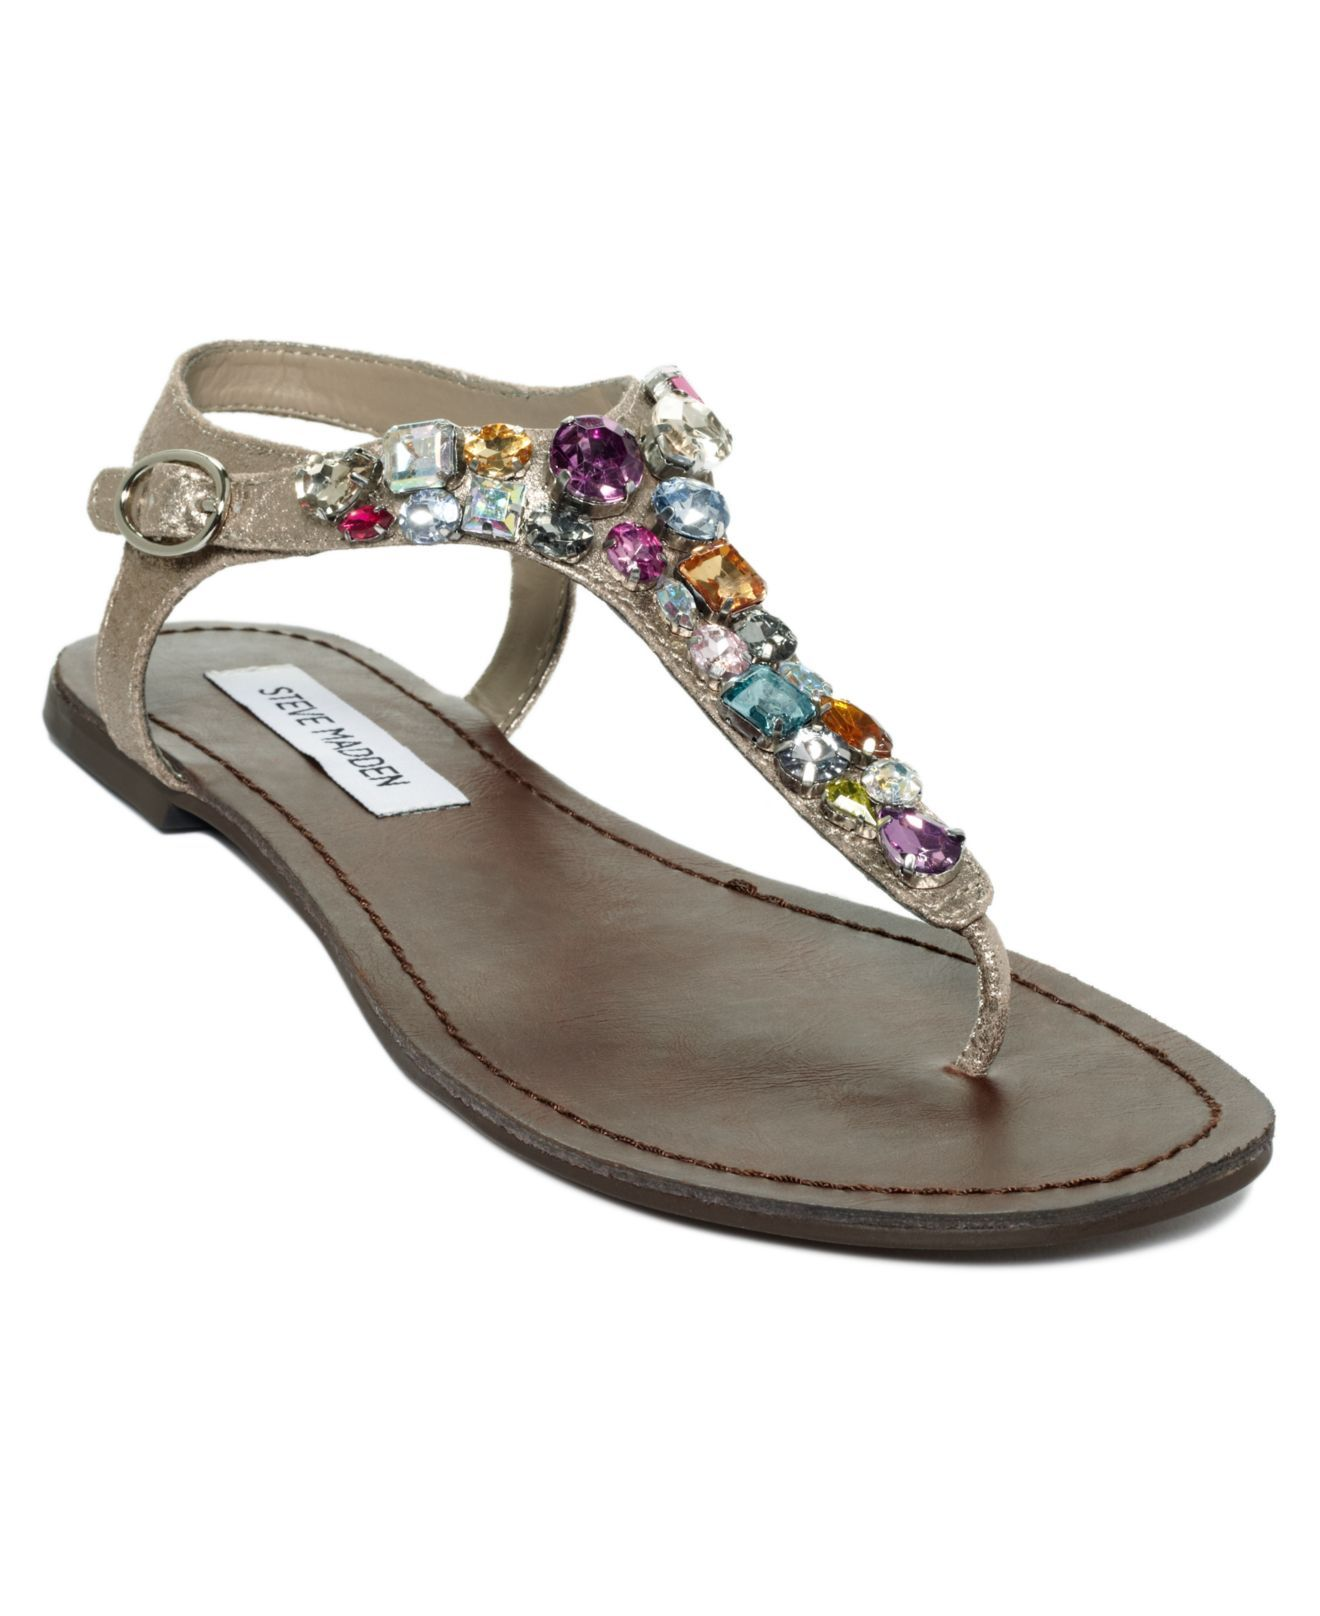 Steve madden shoes, Jeweled sandals